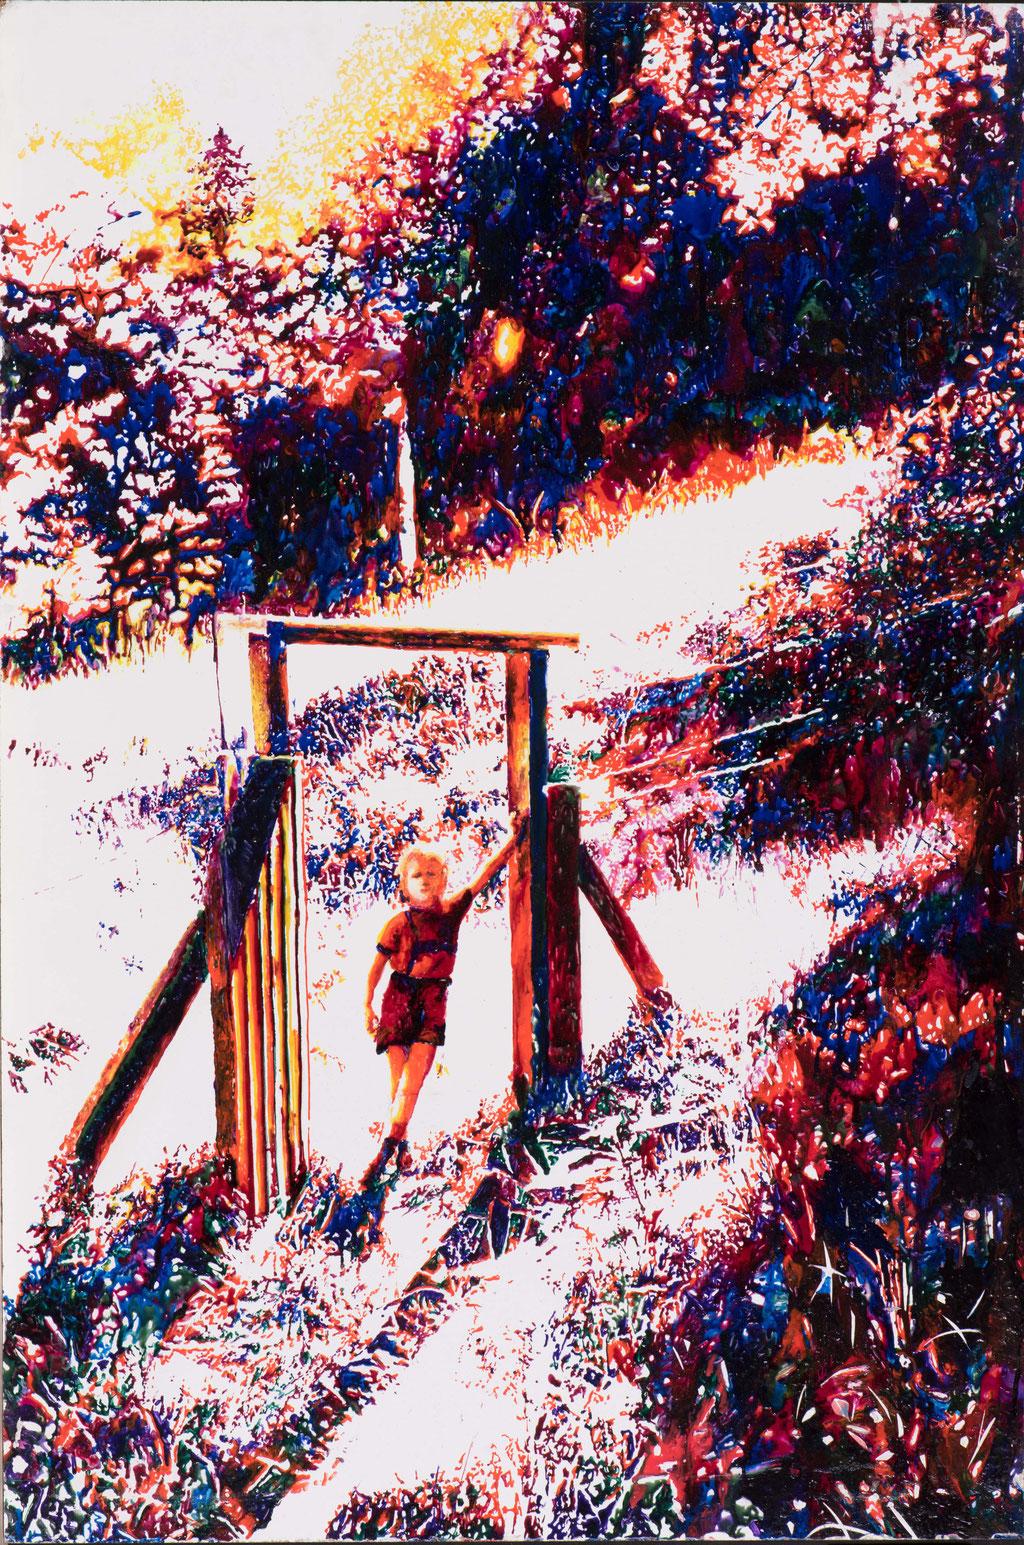 Sebastian, Glasmalfarben auf MDF Platte, 96 x 77 cm, 2015